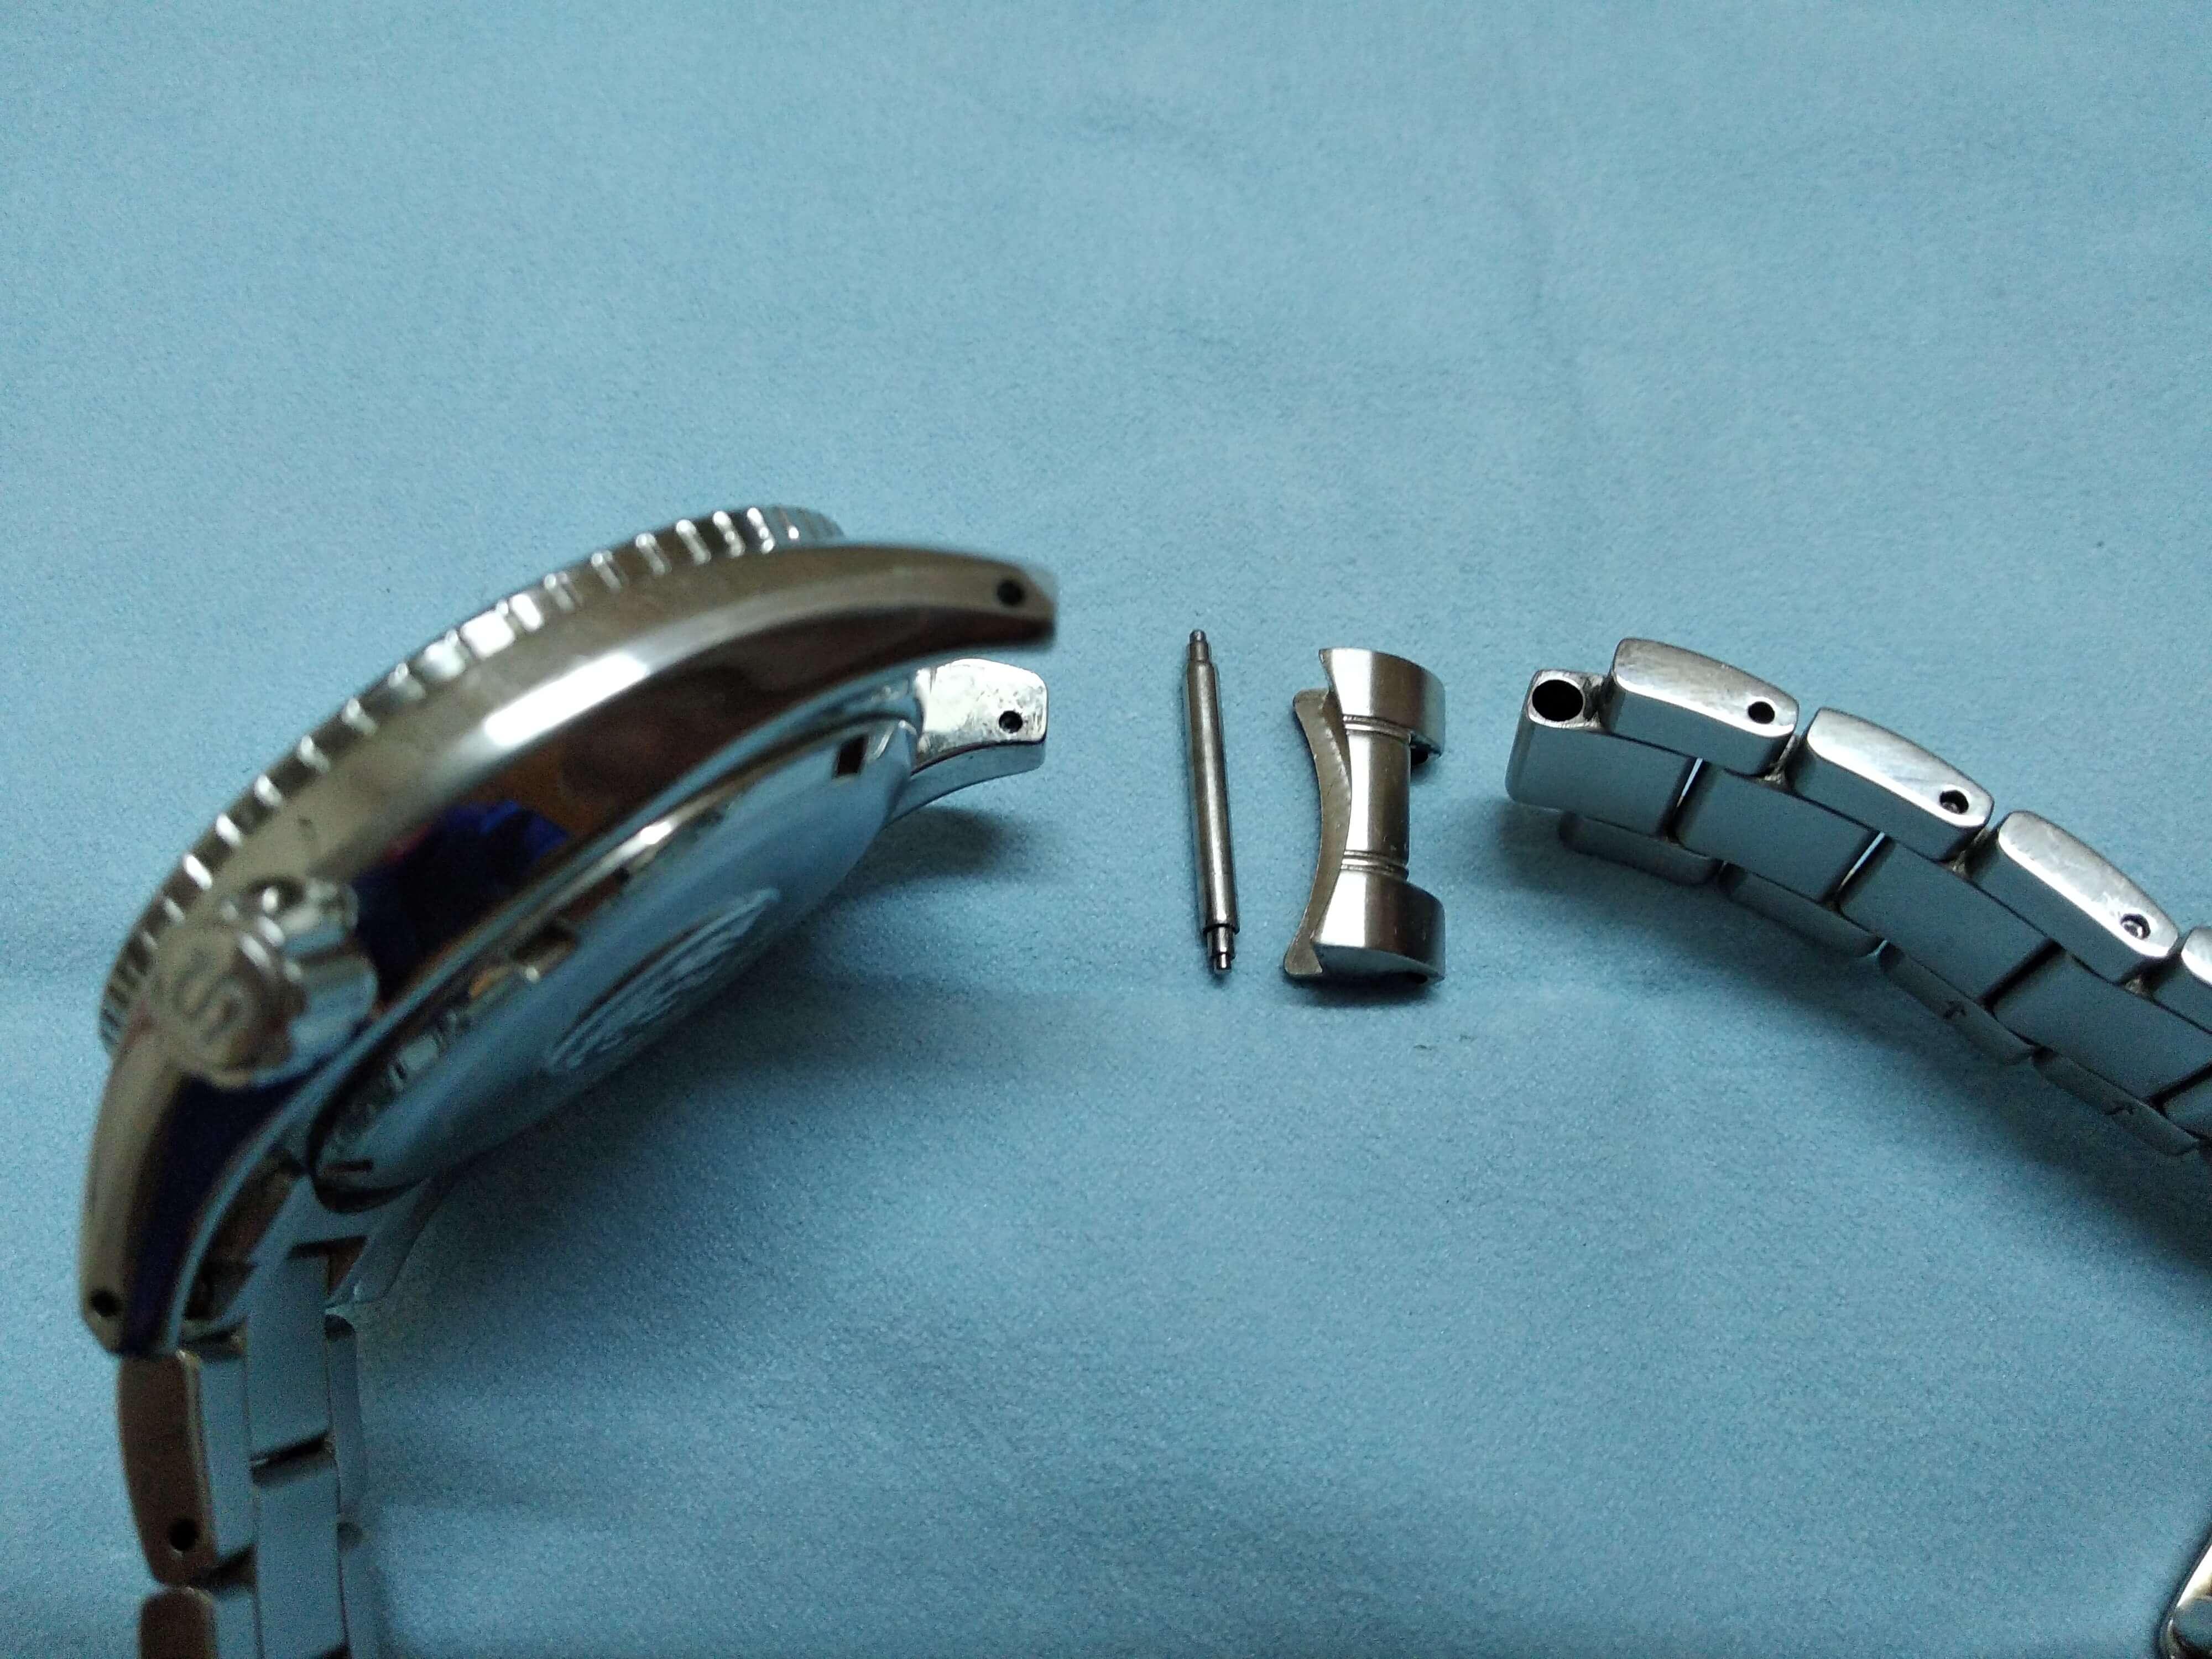 Seiko Sumo Bracelet spring bar